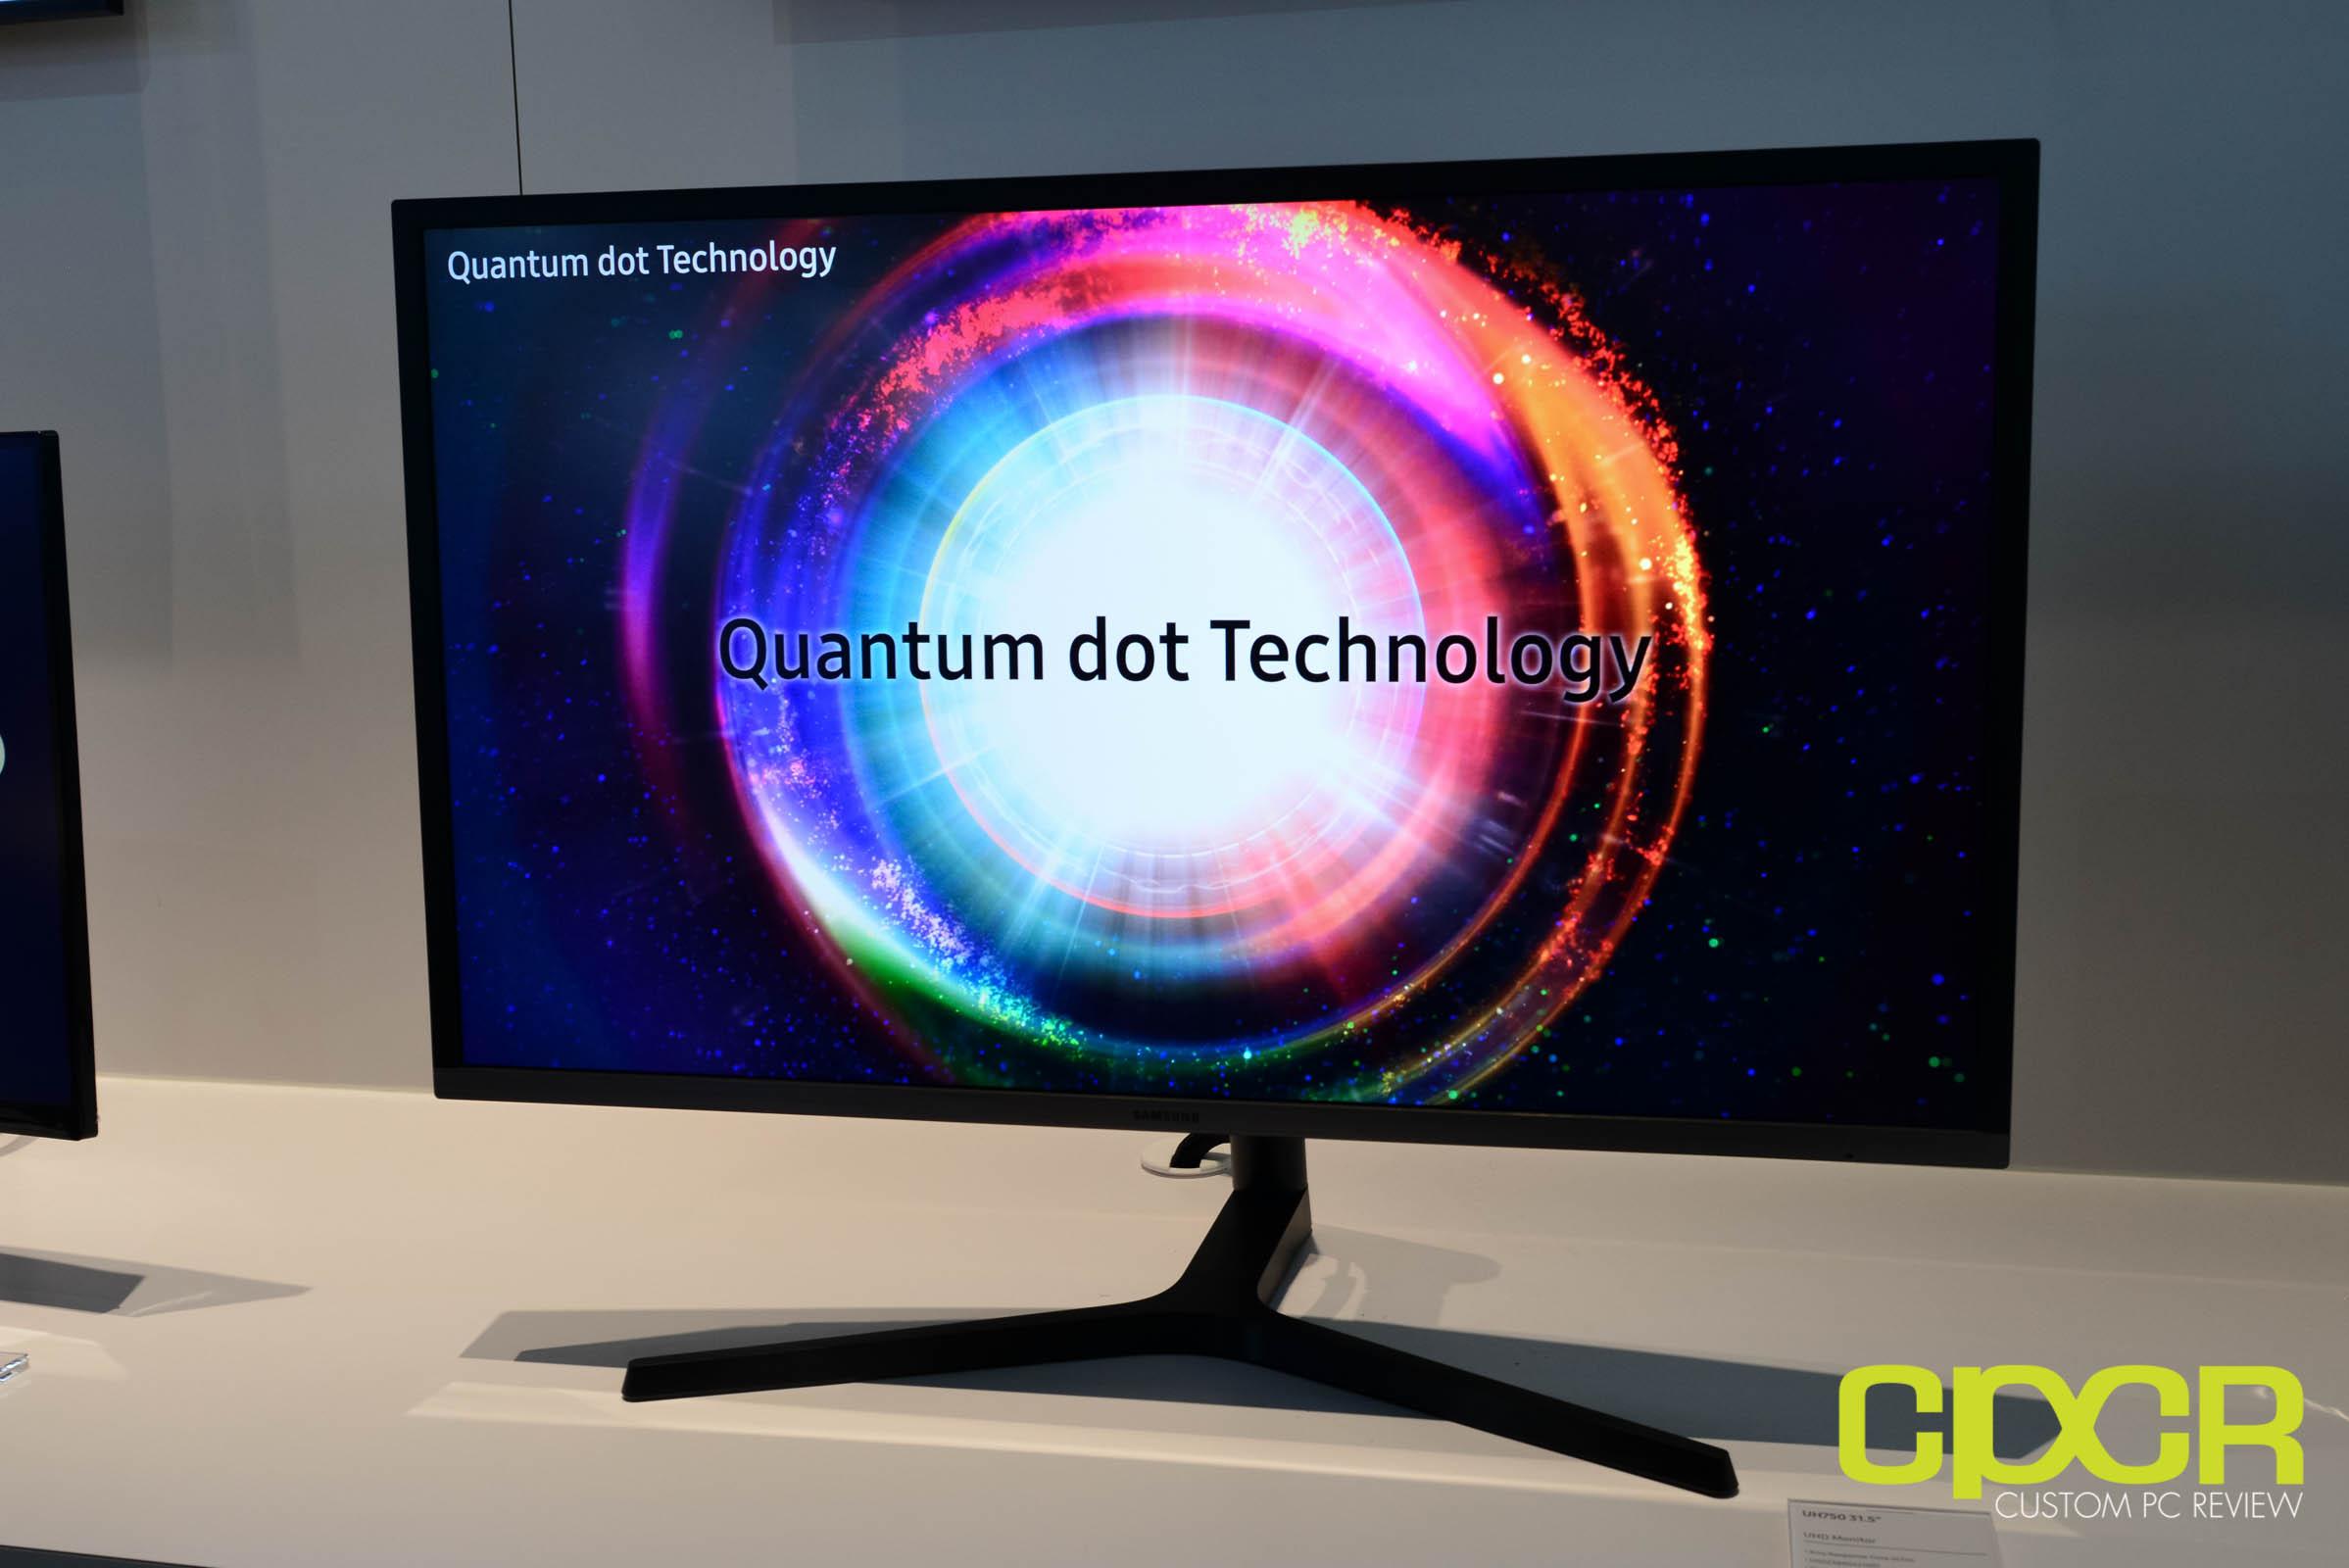 CES 2017: Samsung Displays Stunning CF791, CH711, UH750